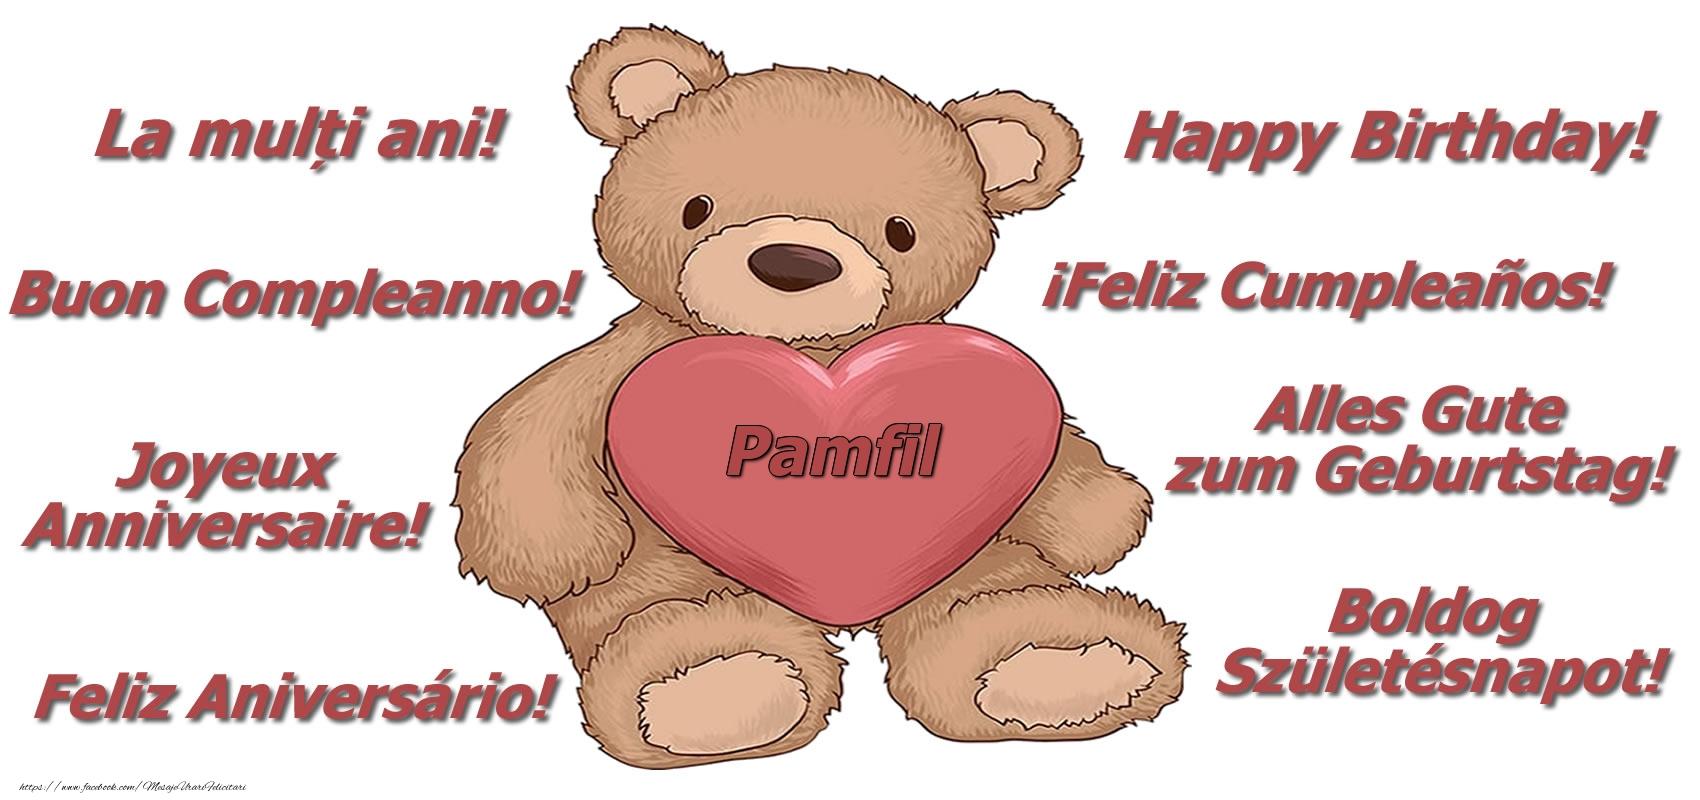 Felicitari de zi de nastere - La multi ani Pamfil! - Ursulet